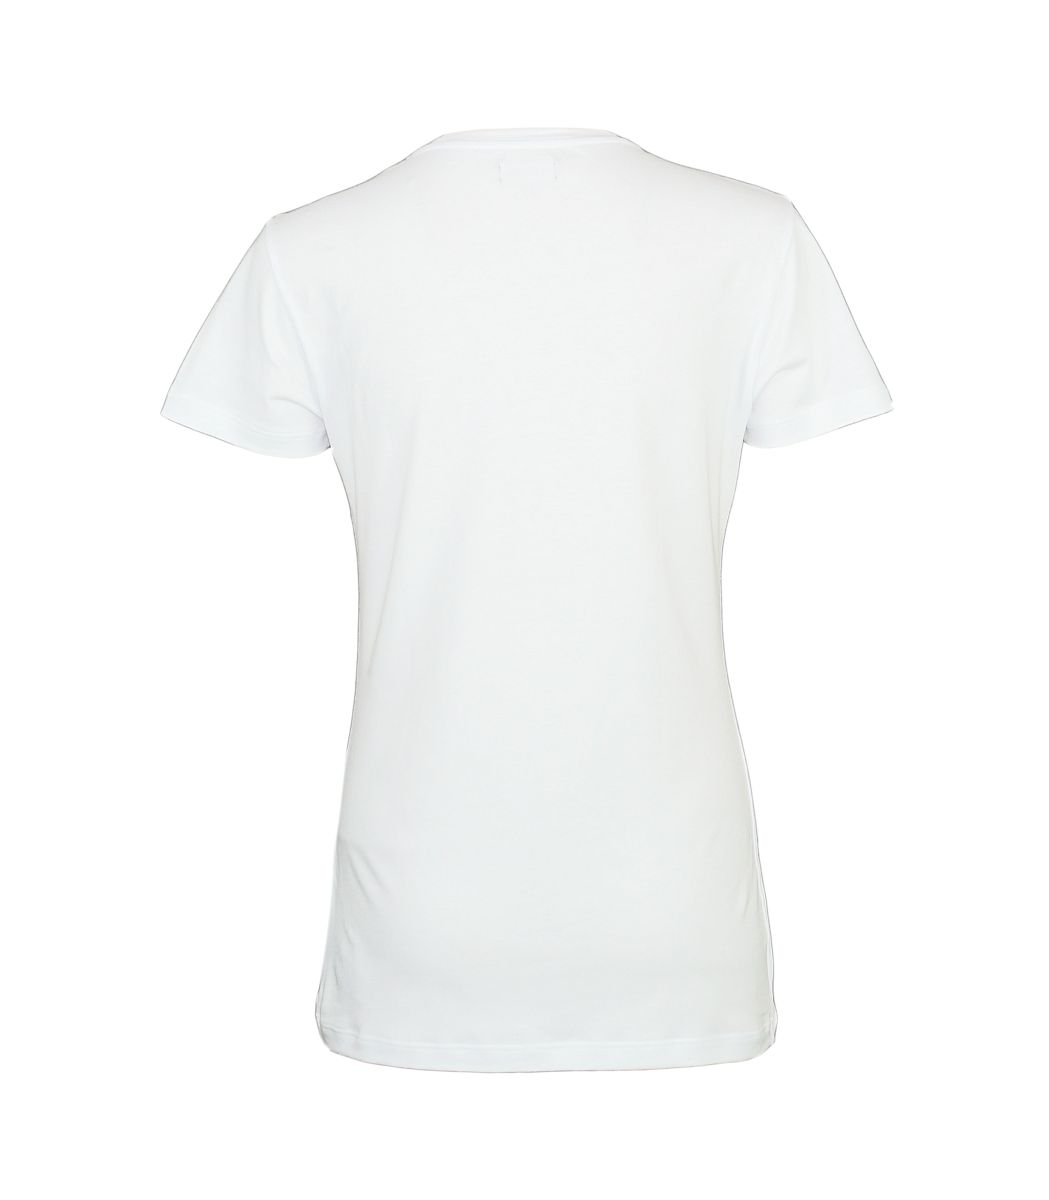 Emporio Armani Damen Shirt T-Shirt V-Ausschnitt 163321 7A317 00010 BIANCO HW17-EADS1